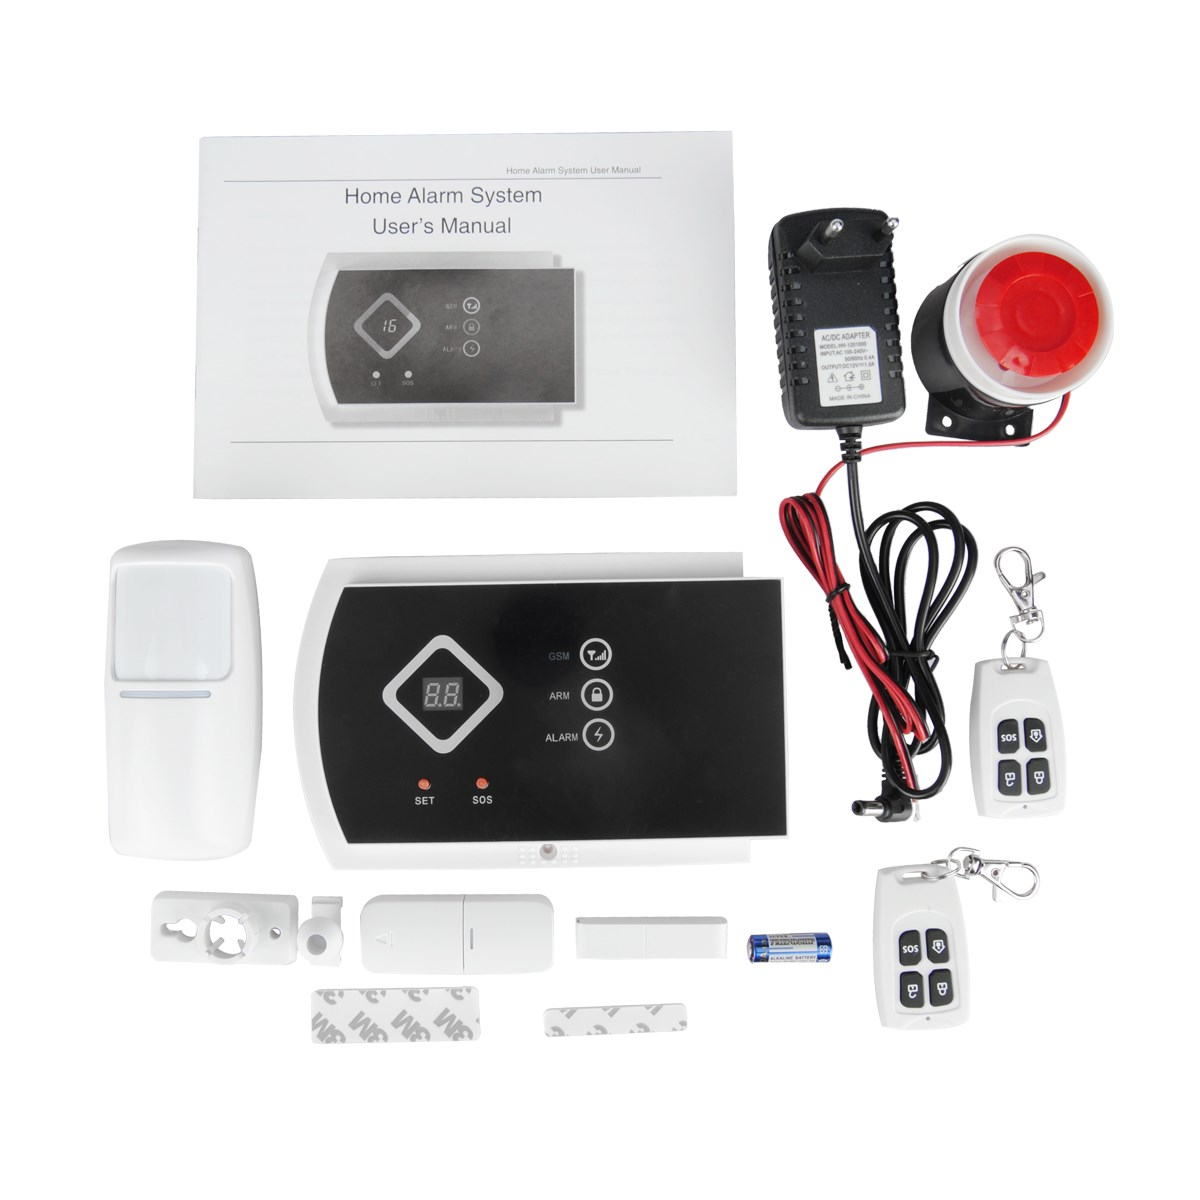 NEW Wireless GSM Alarm System For Home security System SMS GSM Alarm System Home auto Systems with PIR/Door Alarm Sensor 16 ports 3g sms modem bulk sms sending 3g modem pool sim5360 new module bulk sms sending device